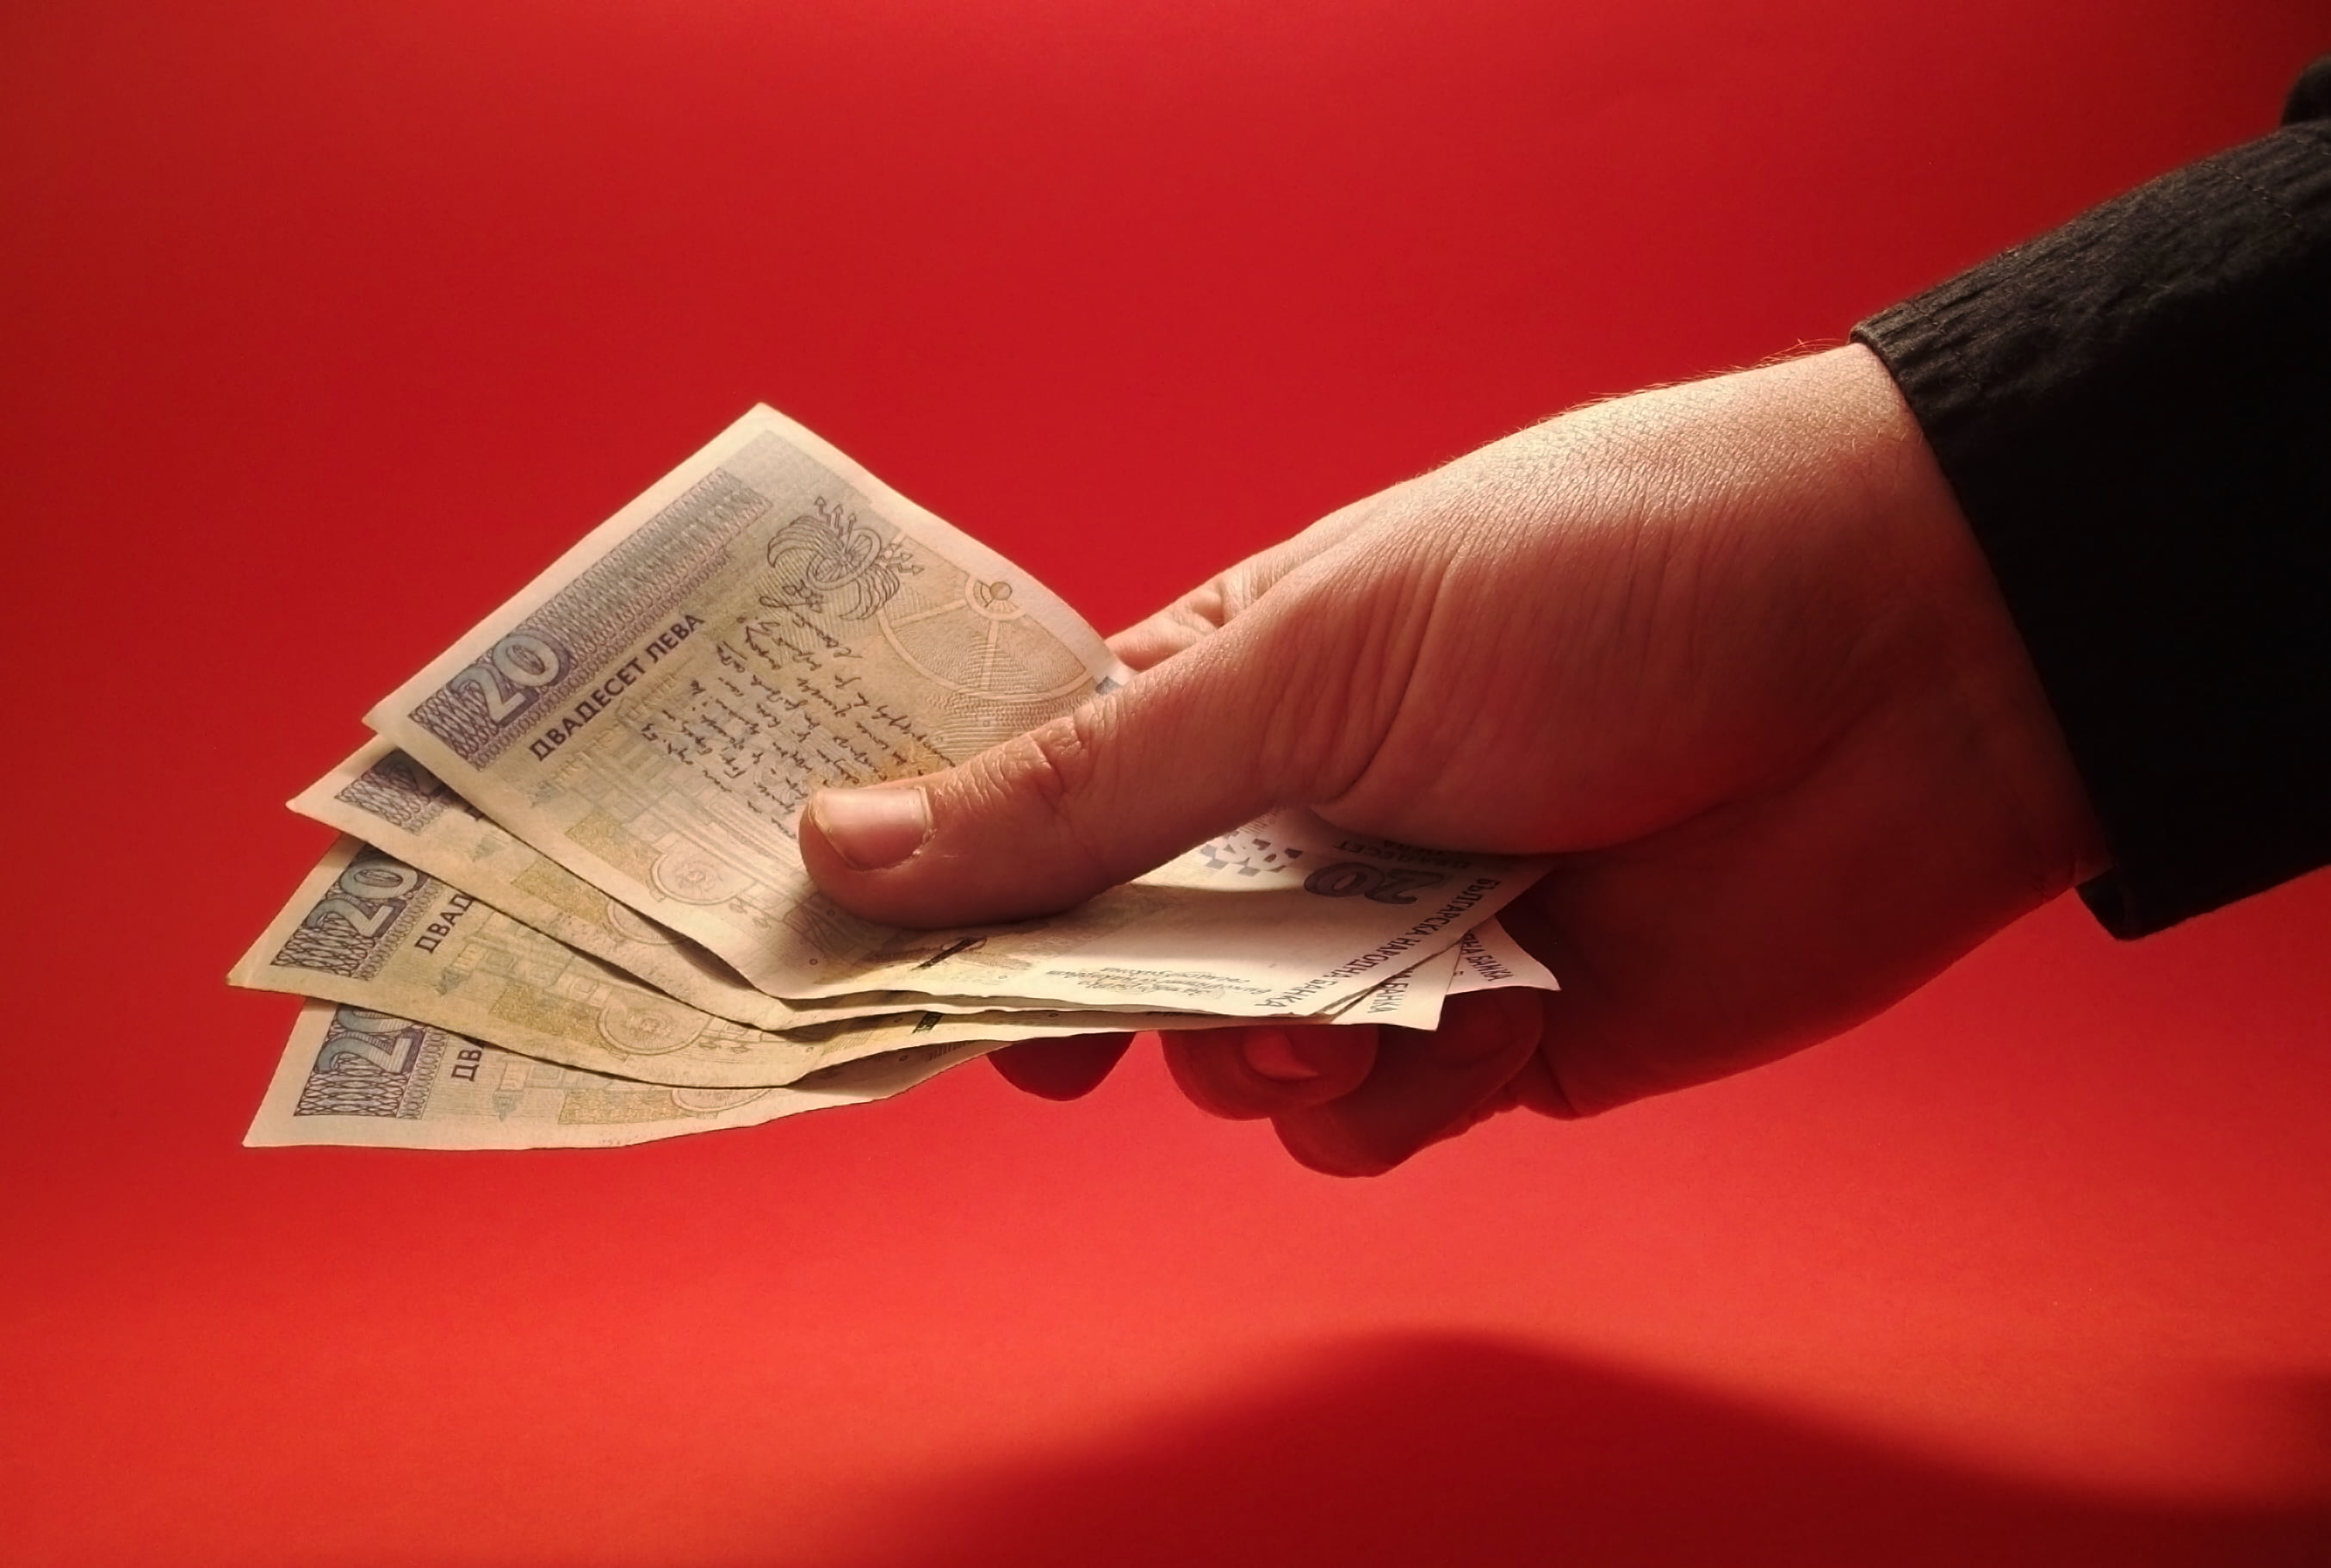 bitcoin payment, bitcoin innovation, bitcoin acceptance, barry silbert